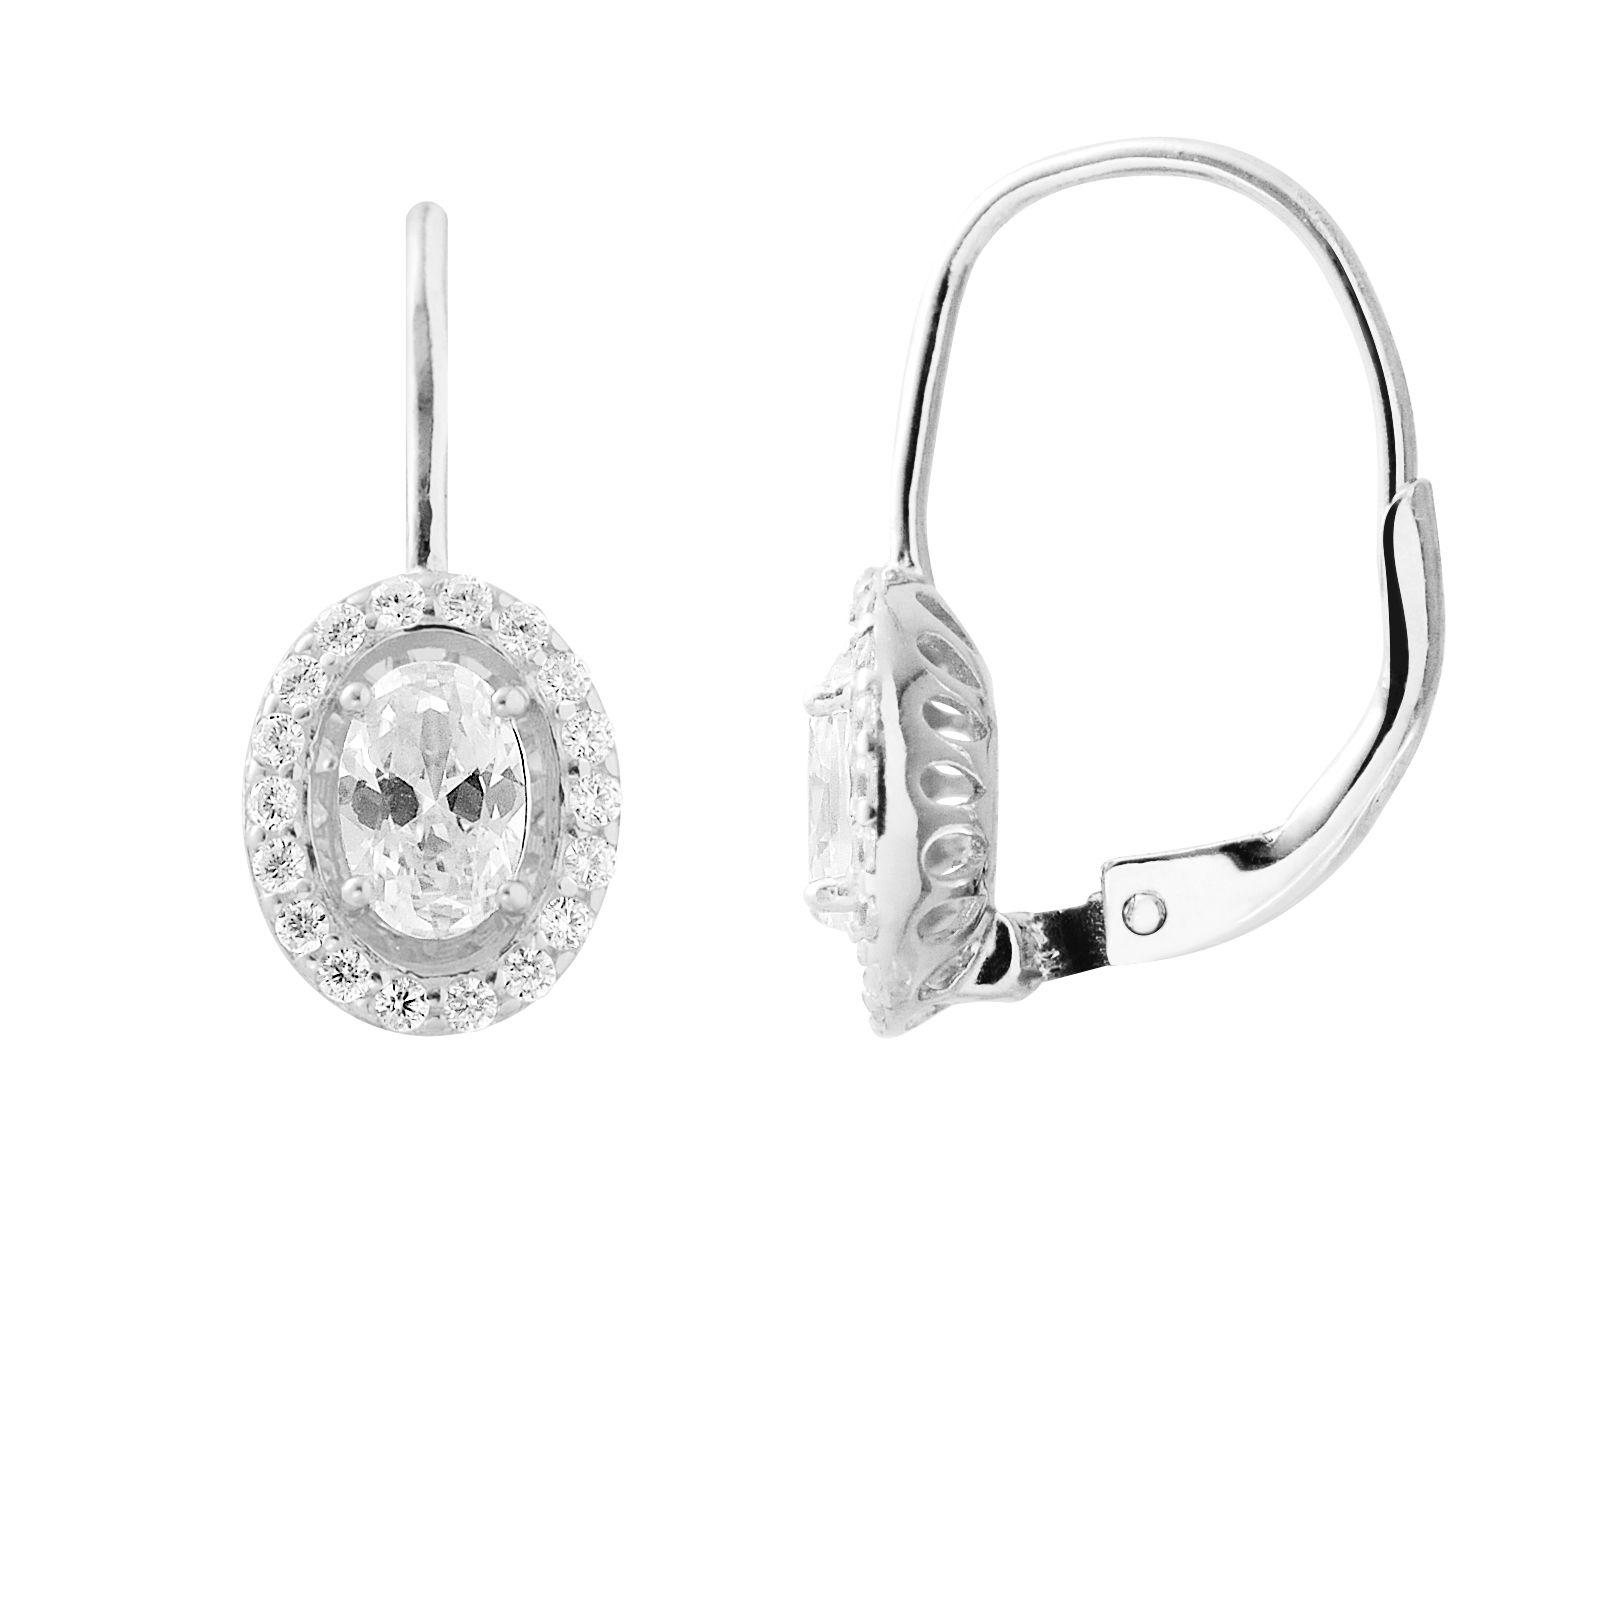 DIADEMA - Earrings - High Jewelery - Crystal Love Jewelry Collection